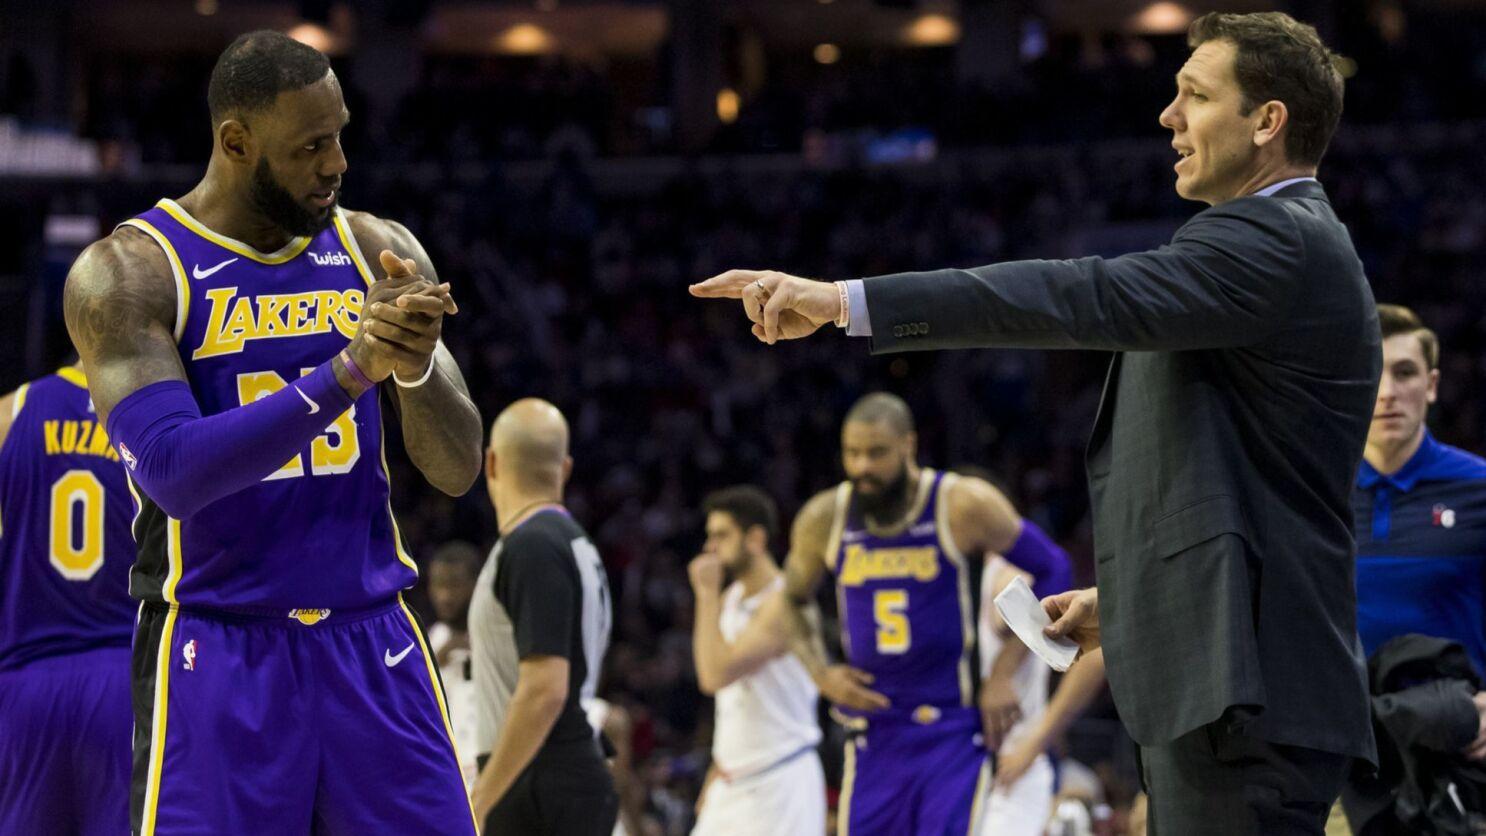 f4c2b48e126 Column  LeBron-led Lakers became a  lose-lose  situation for Luke Walton -  The San Diego Union-Tribune